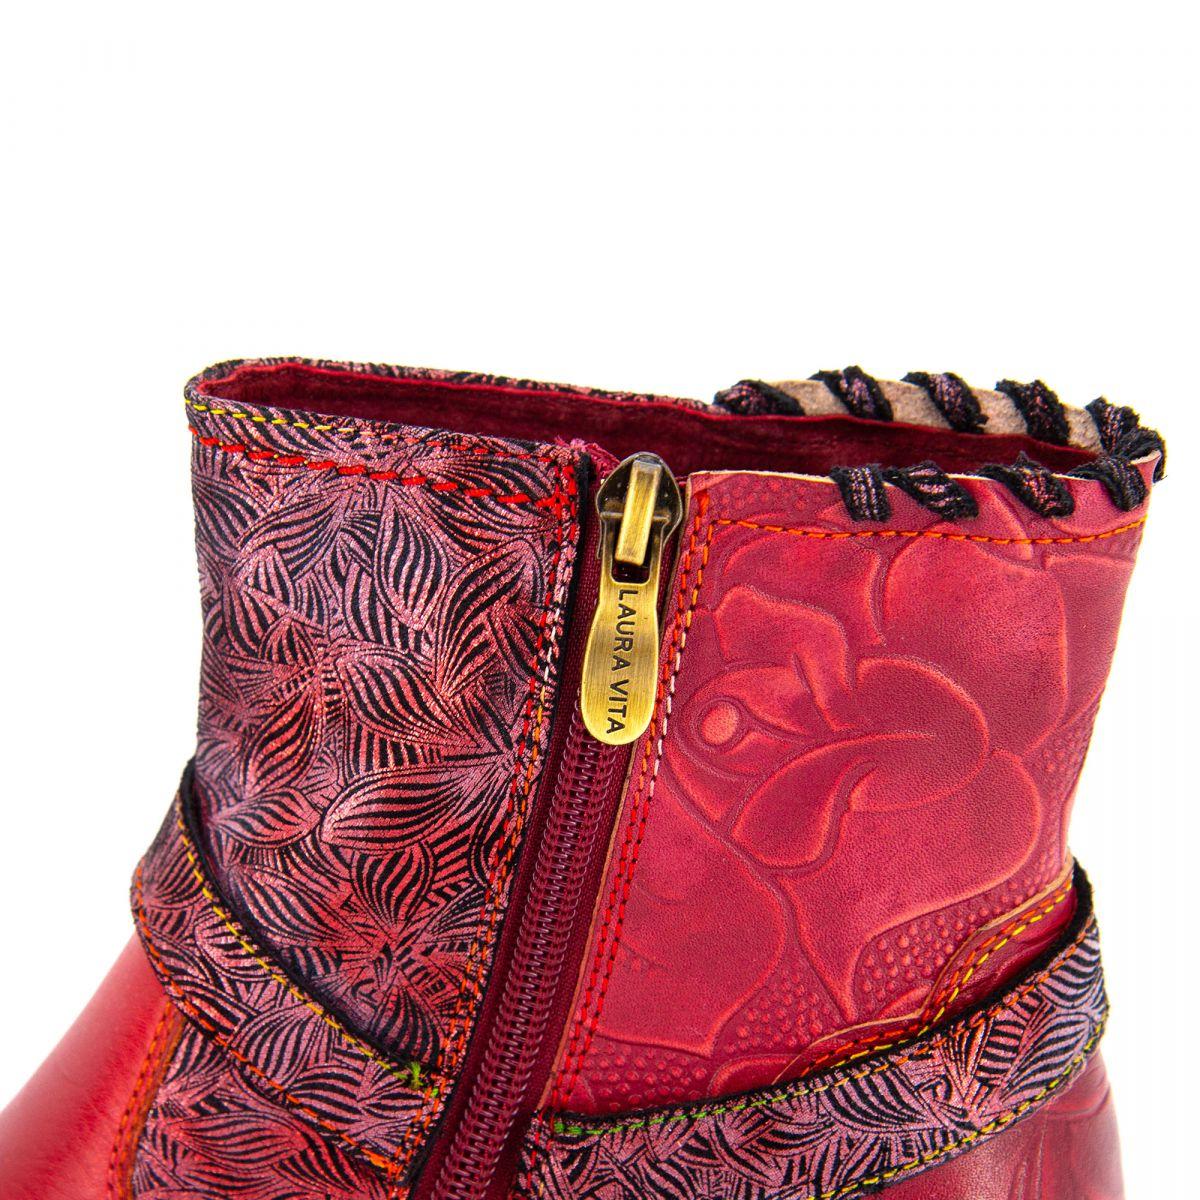 Bottines à talons rouge Gicrono 01 Femme LAURA VITA à prix